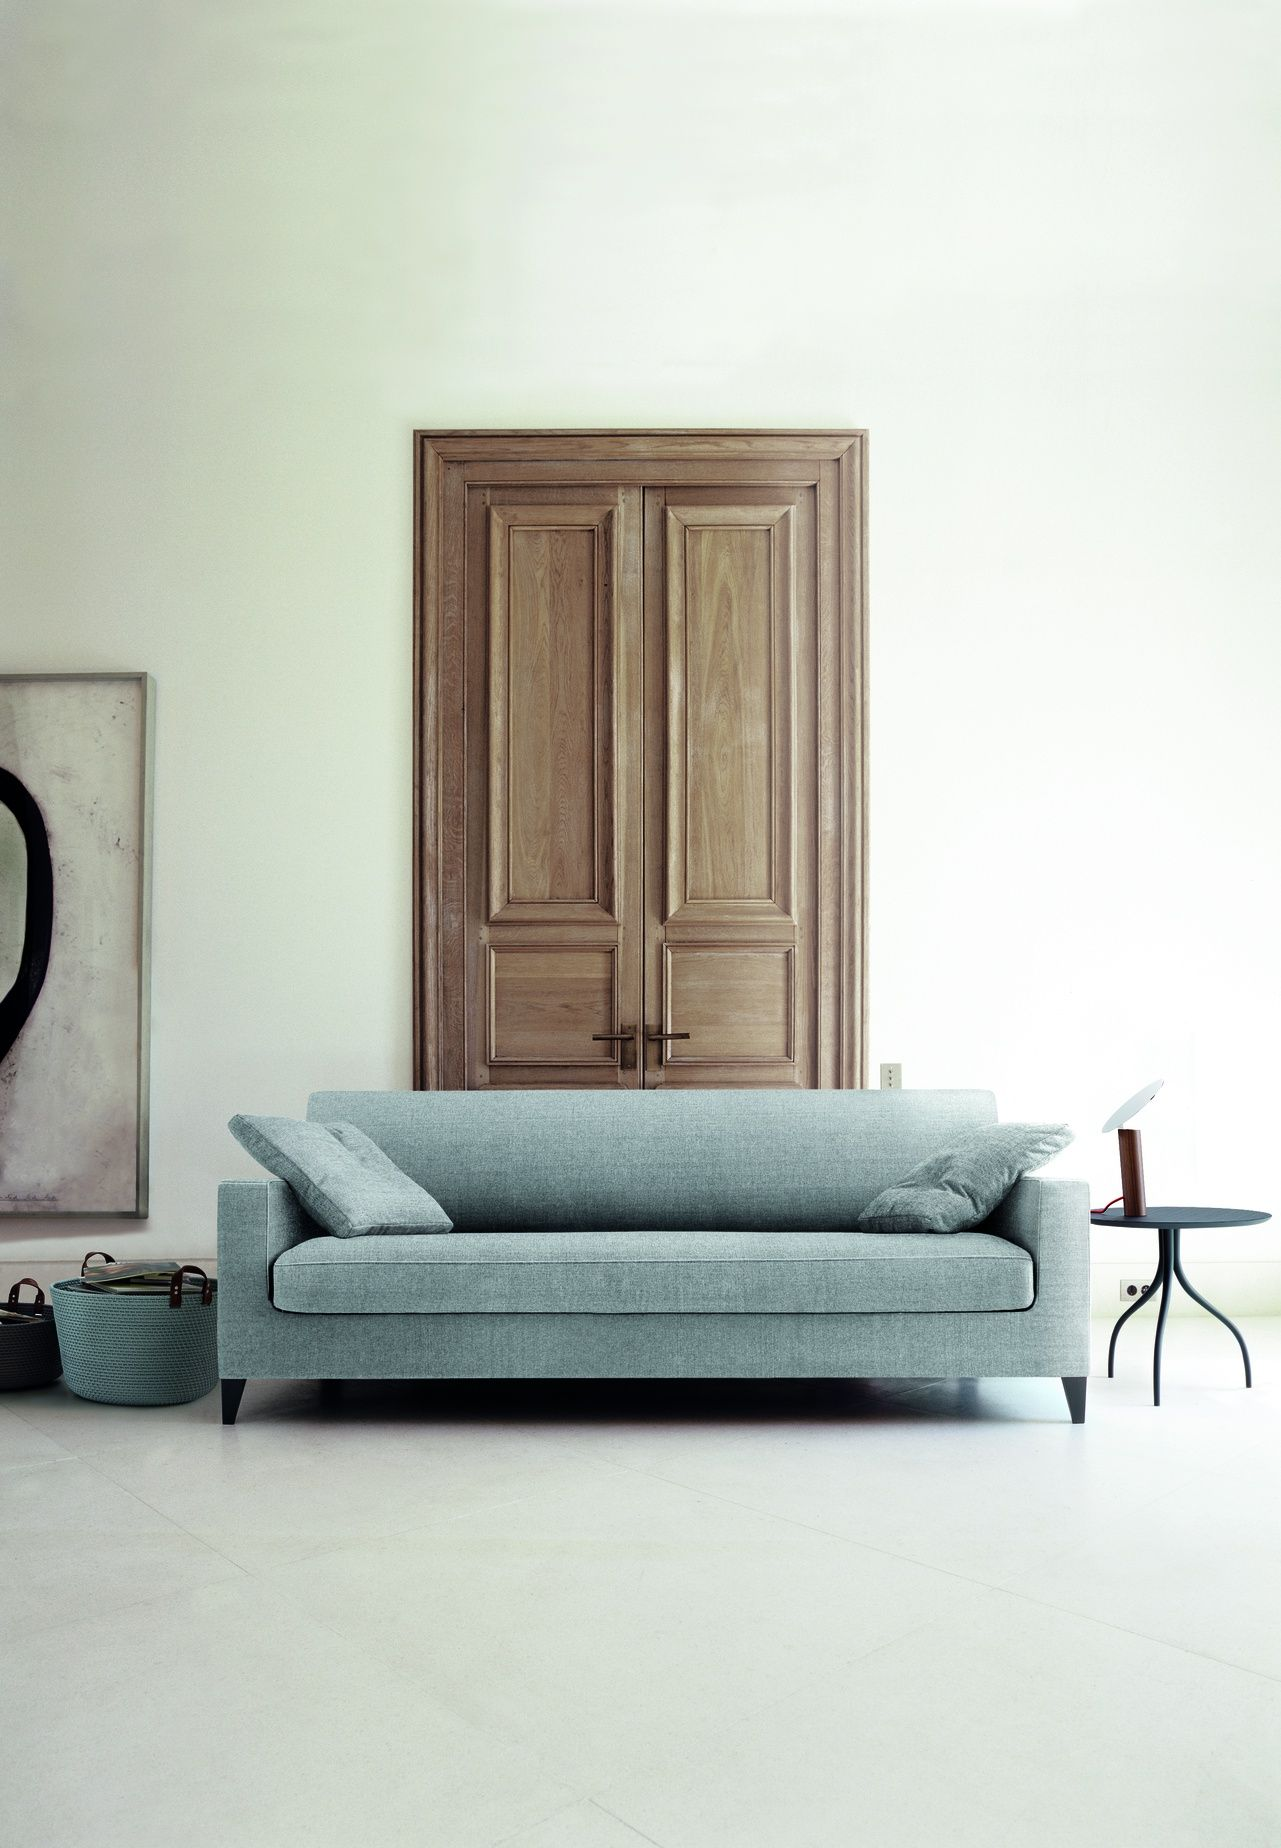 canap de designer resultat superieur canape cuir design italien nouveau red edition canap. Black Bedroom Furniture Sets. Home Design Ideas